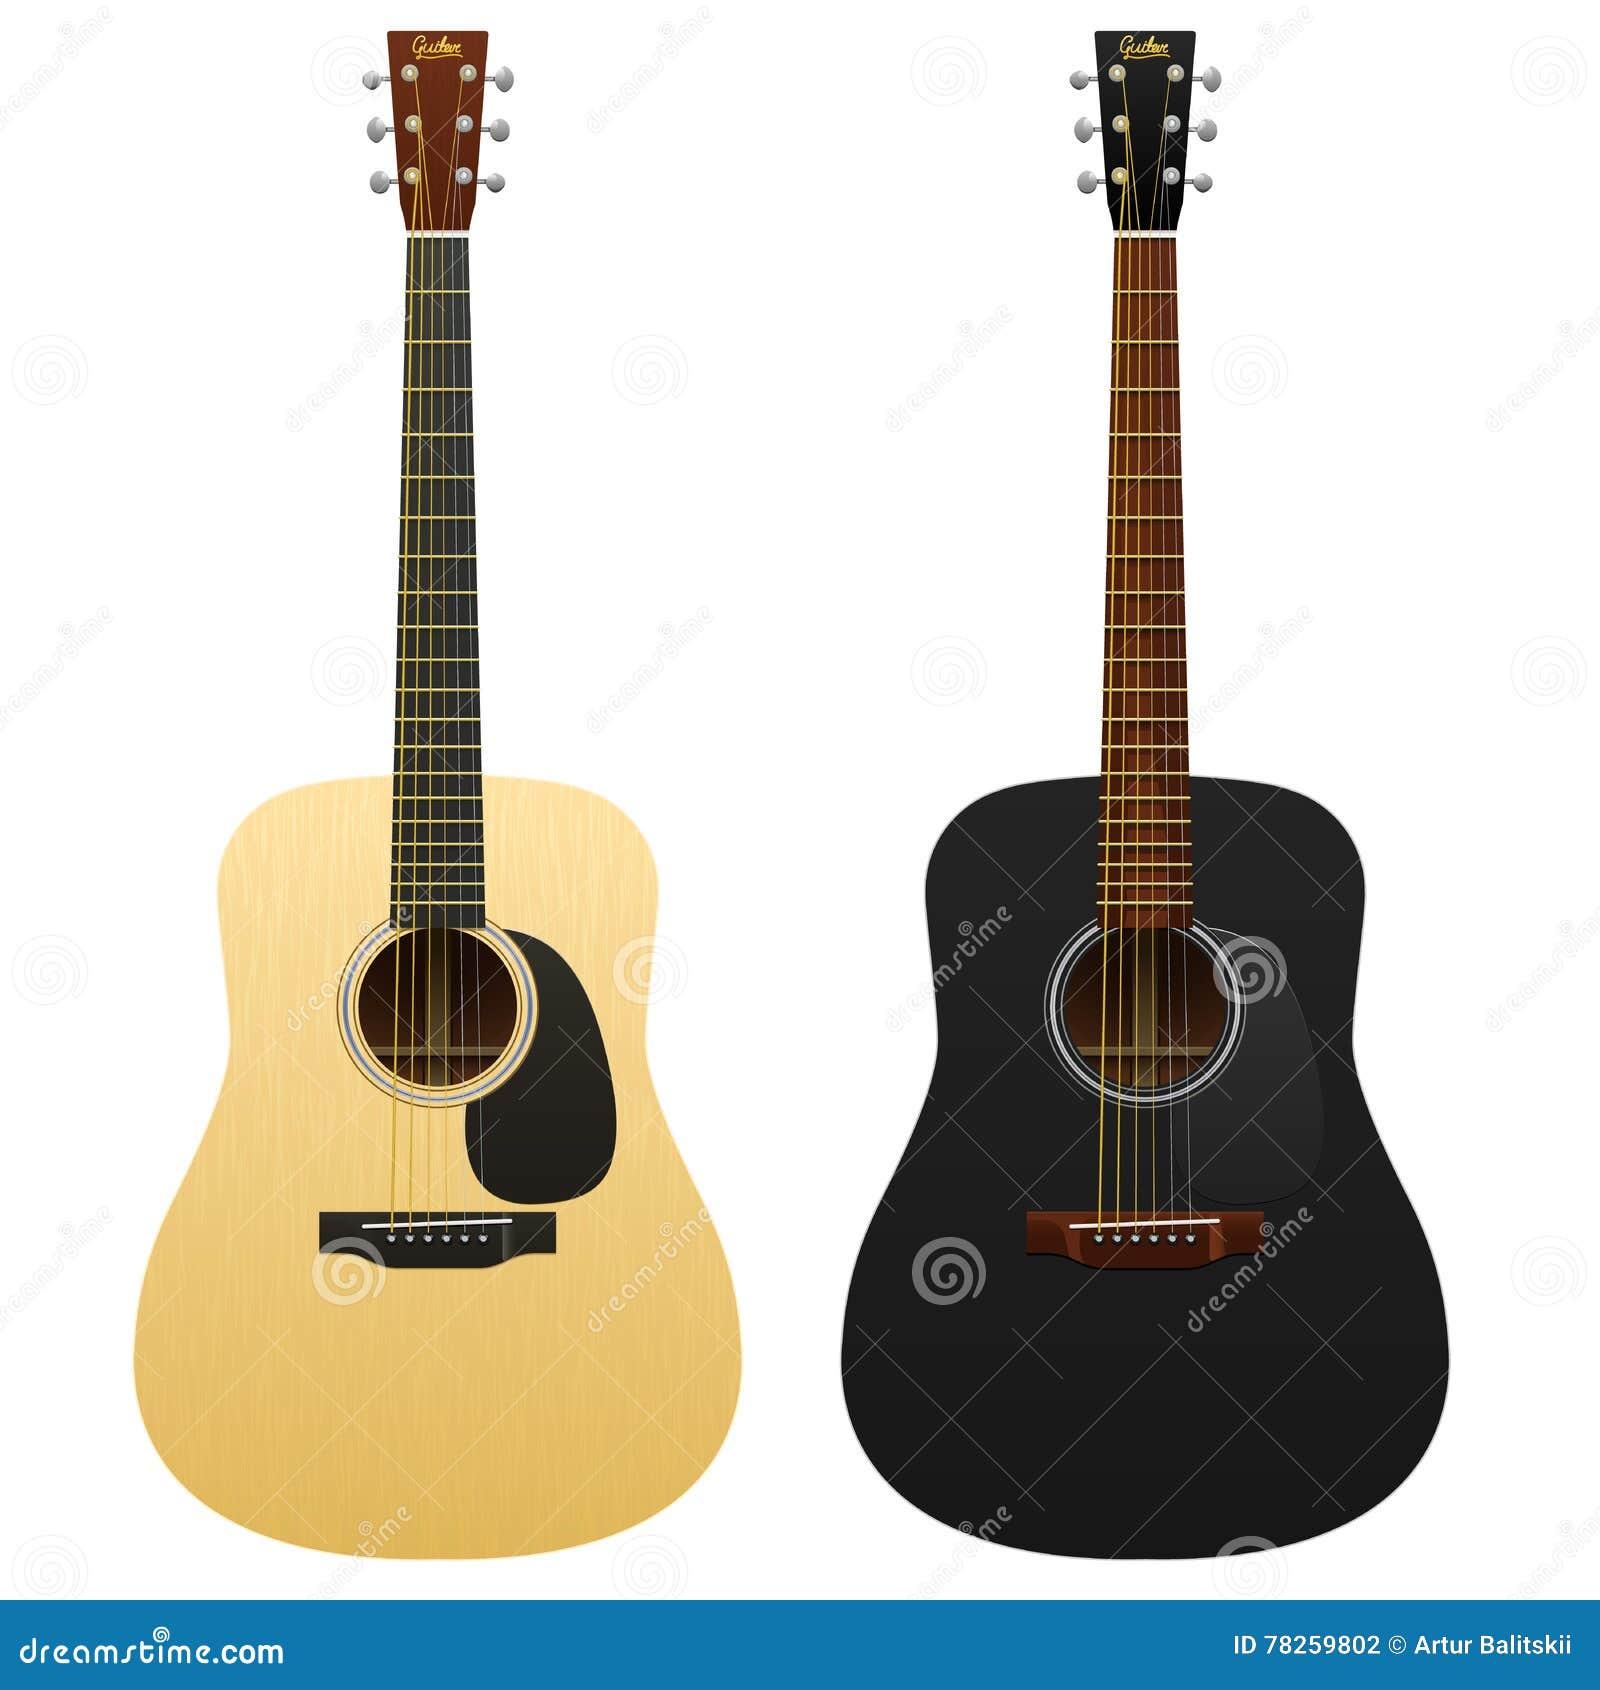 Las guitarras acústicas realistas aislaron la guitarra clásica occidental de dos instrumentos musicales, clásica